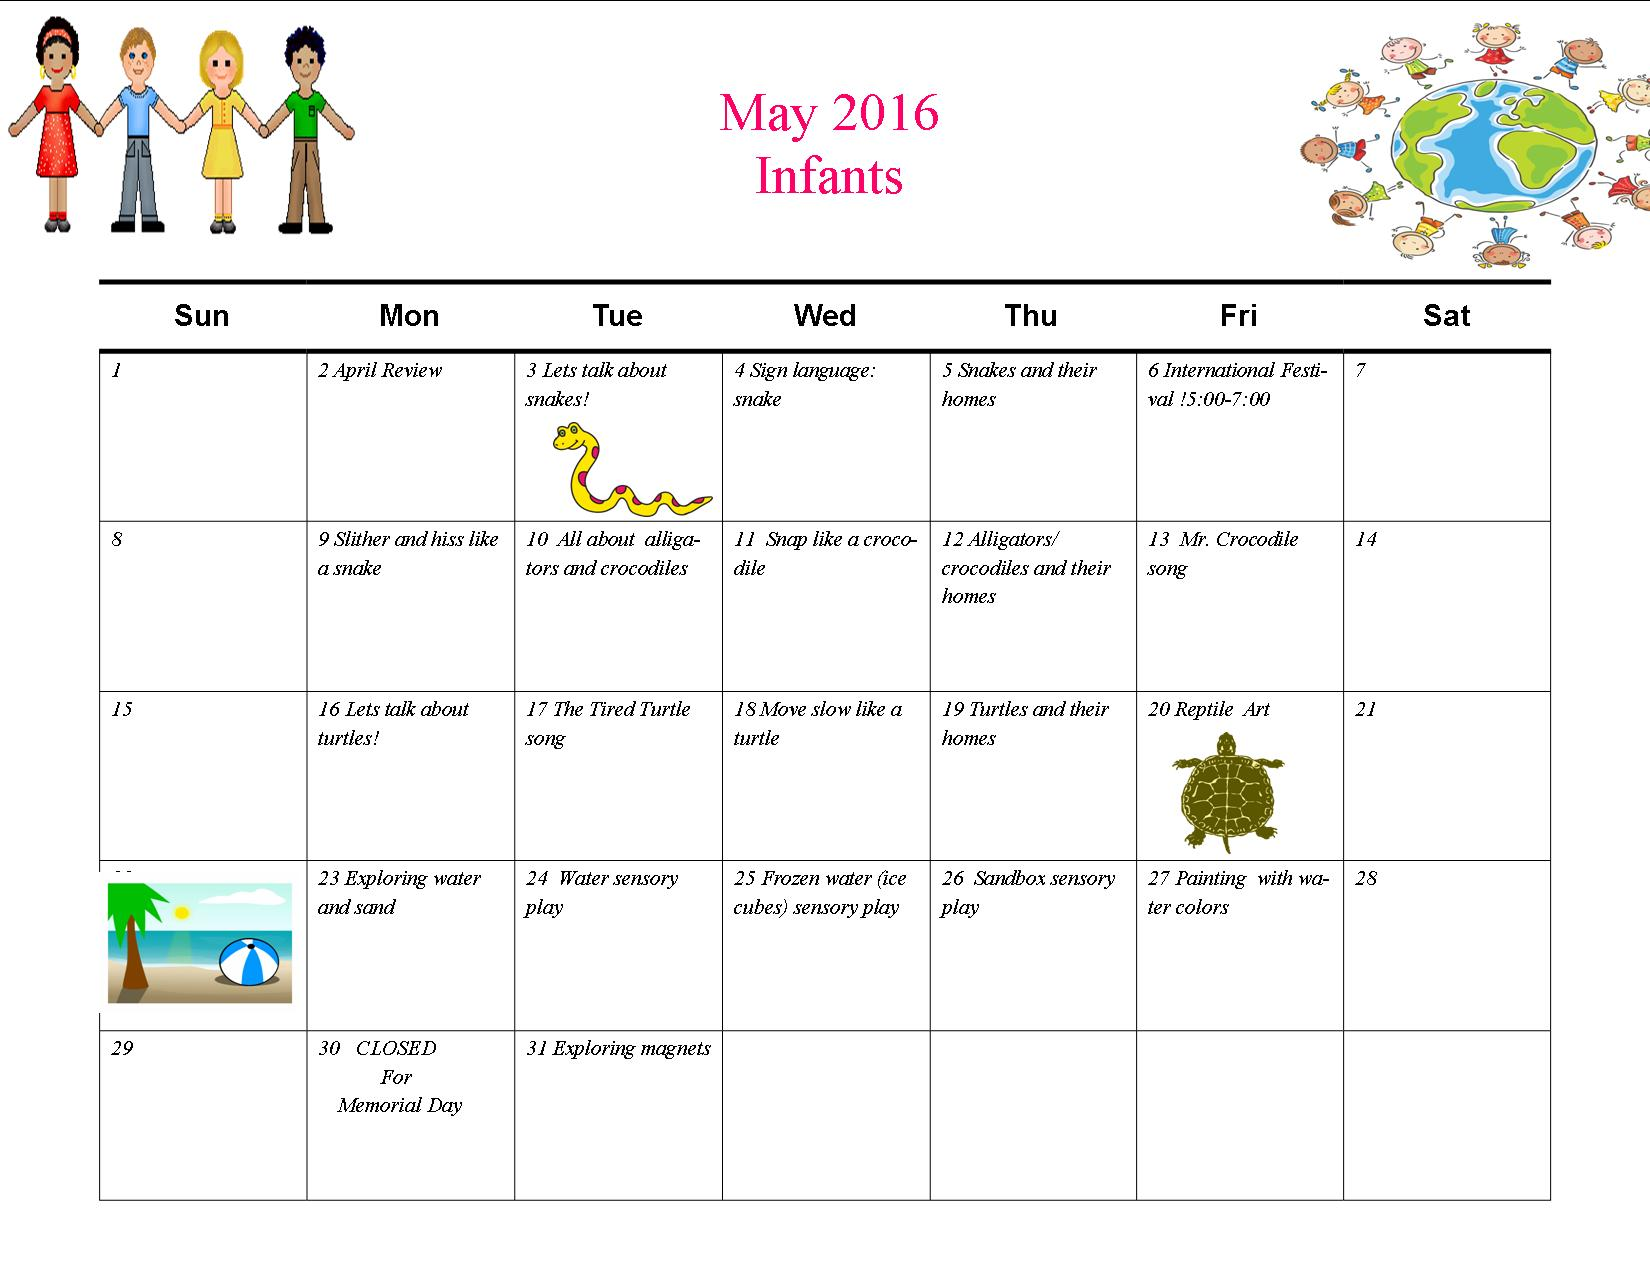 1006578-HC_infants_2016_may